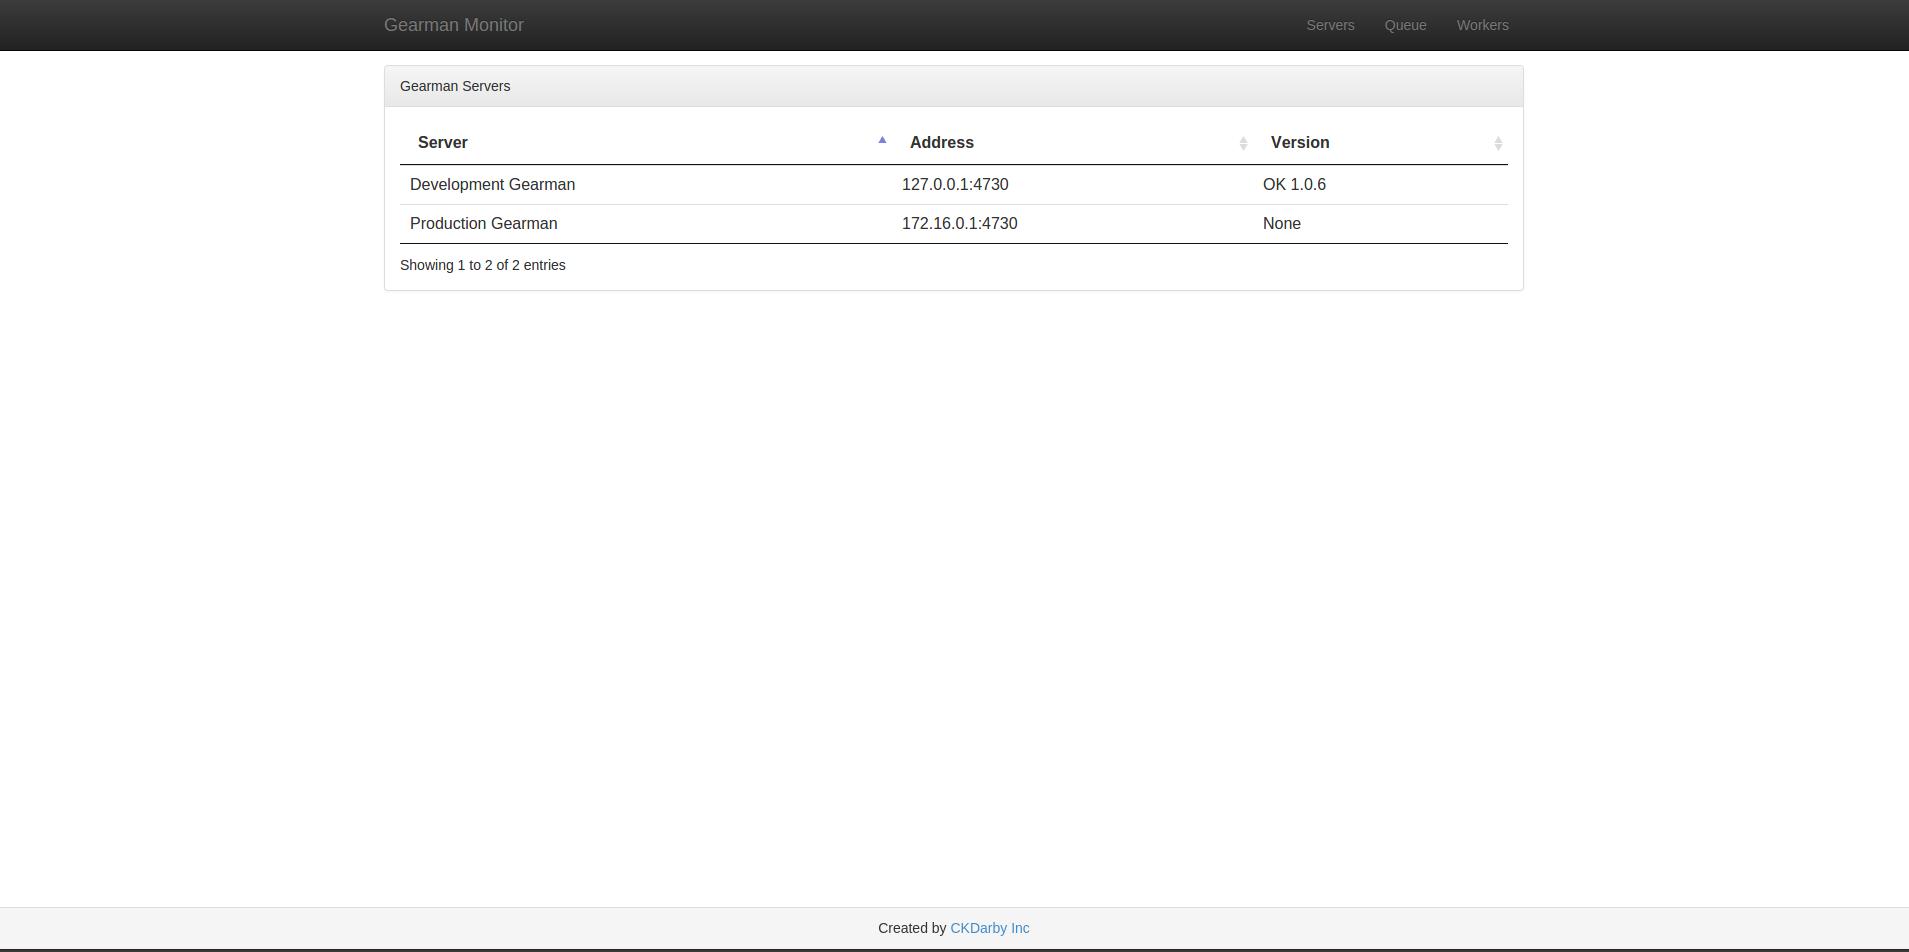 Gearman Monitor Screenshot